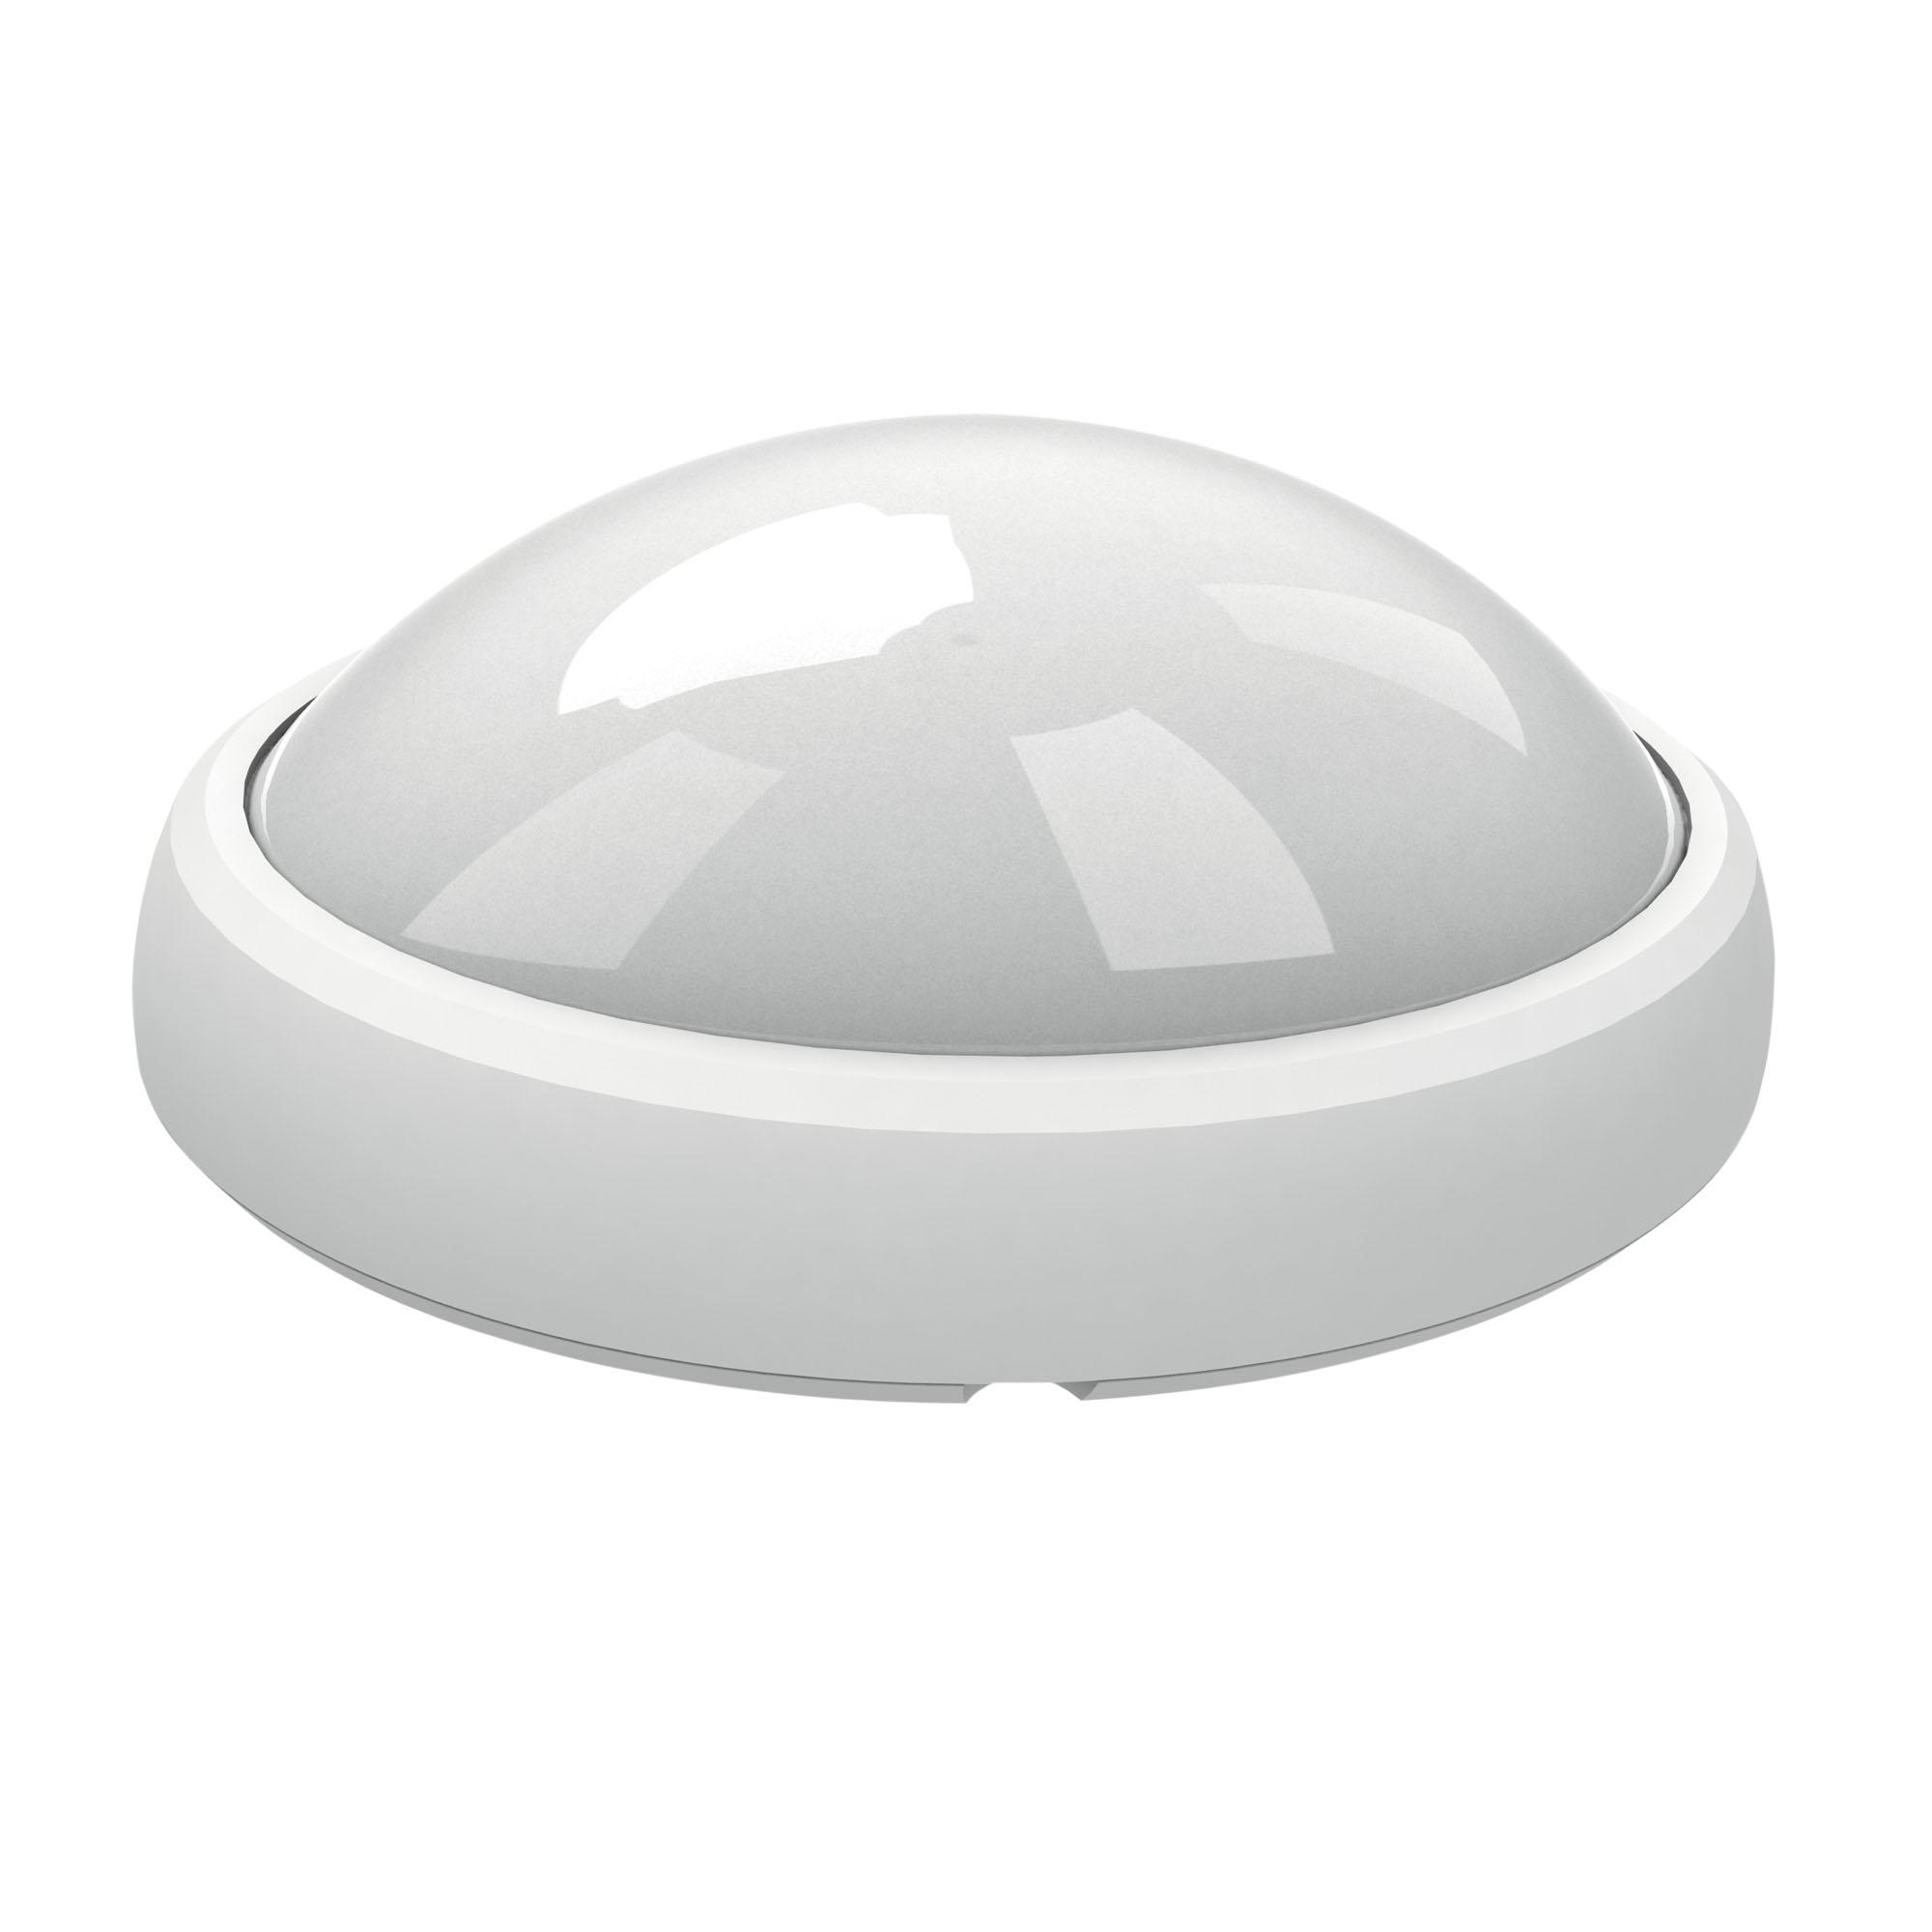 Ulw-o04-12w/nw ip65 white, Светильник настенно-потолочный